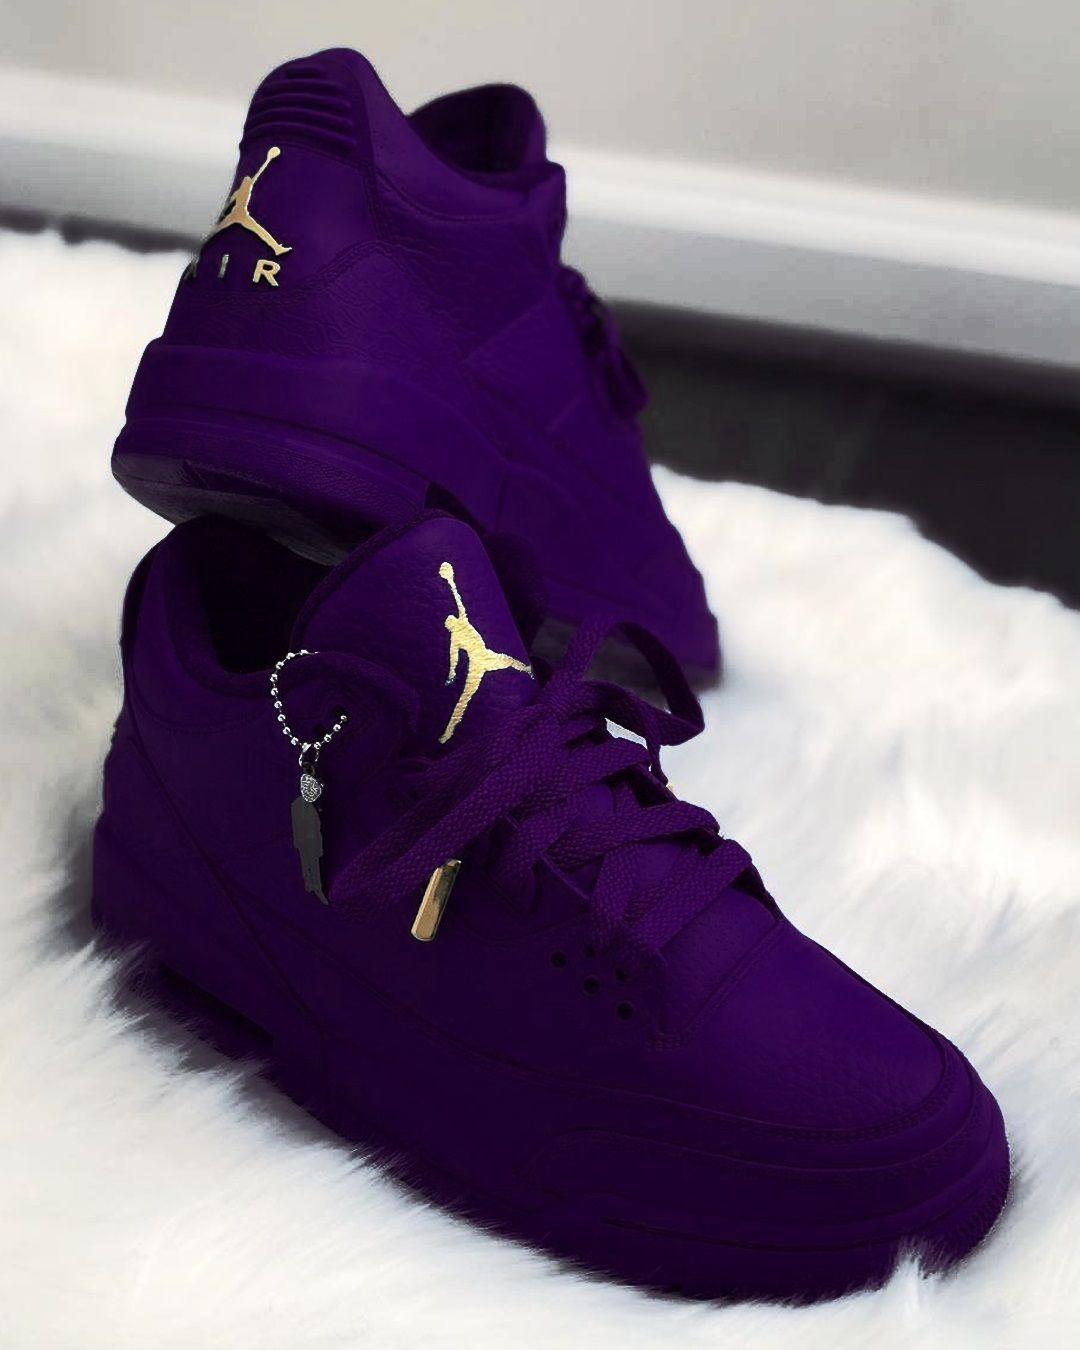 info for 5af5b 8b130 Air Jordan Custom for Womans Tipos De Zapatos, Zapatos Bonitos, Tenis  Masculino, Zapatillas